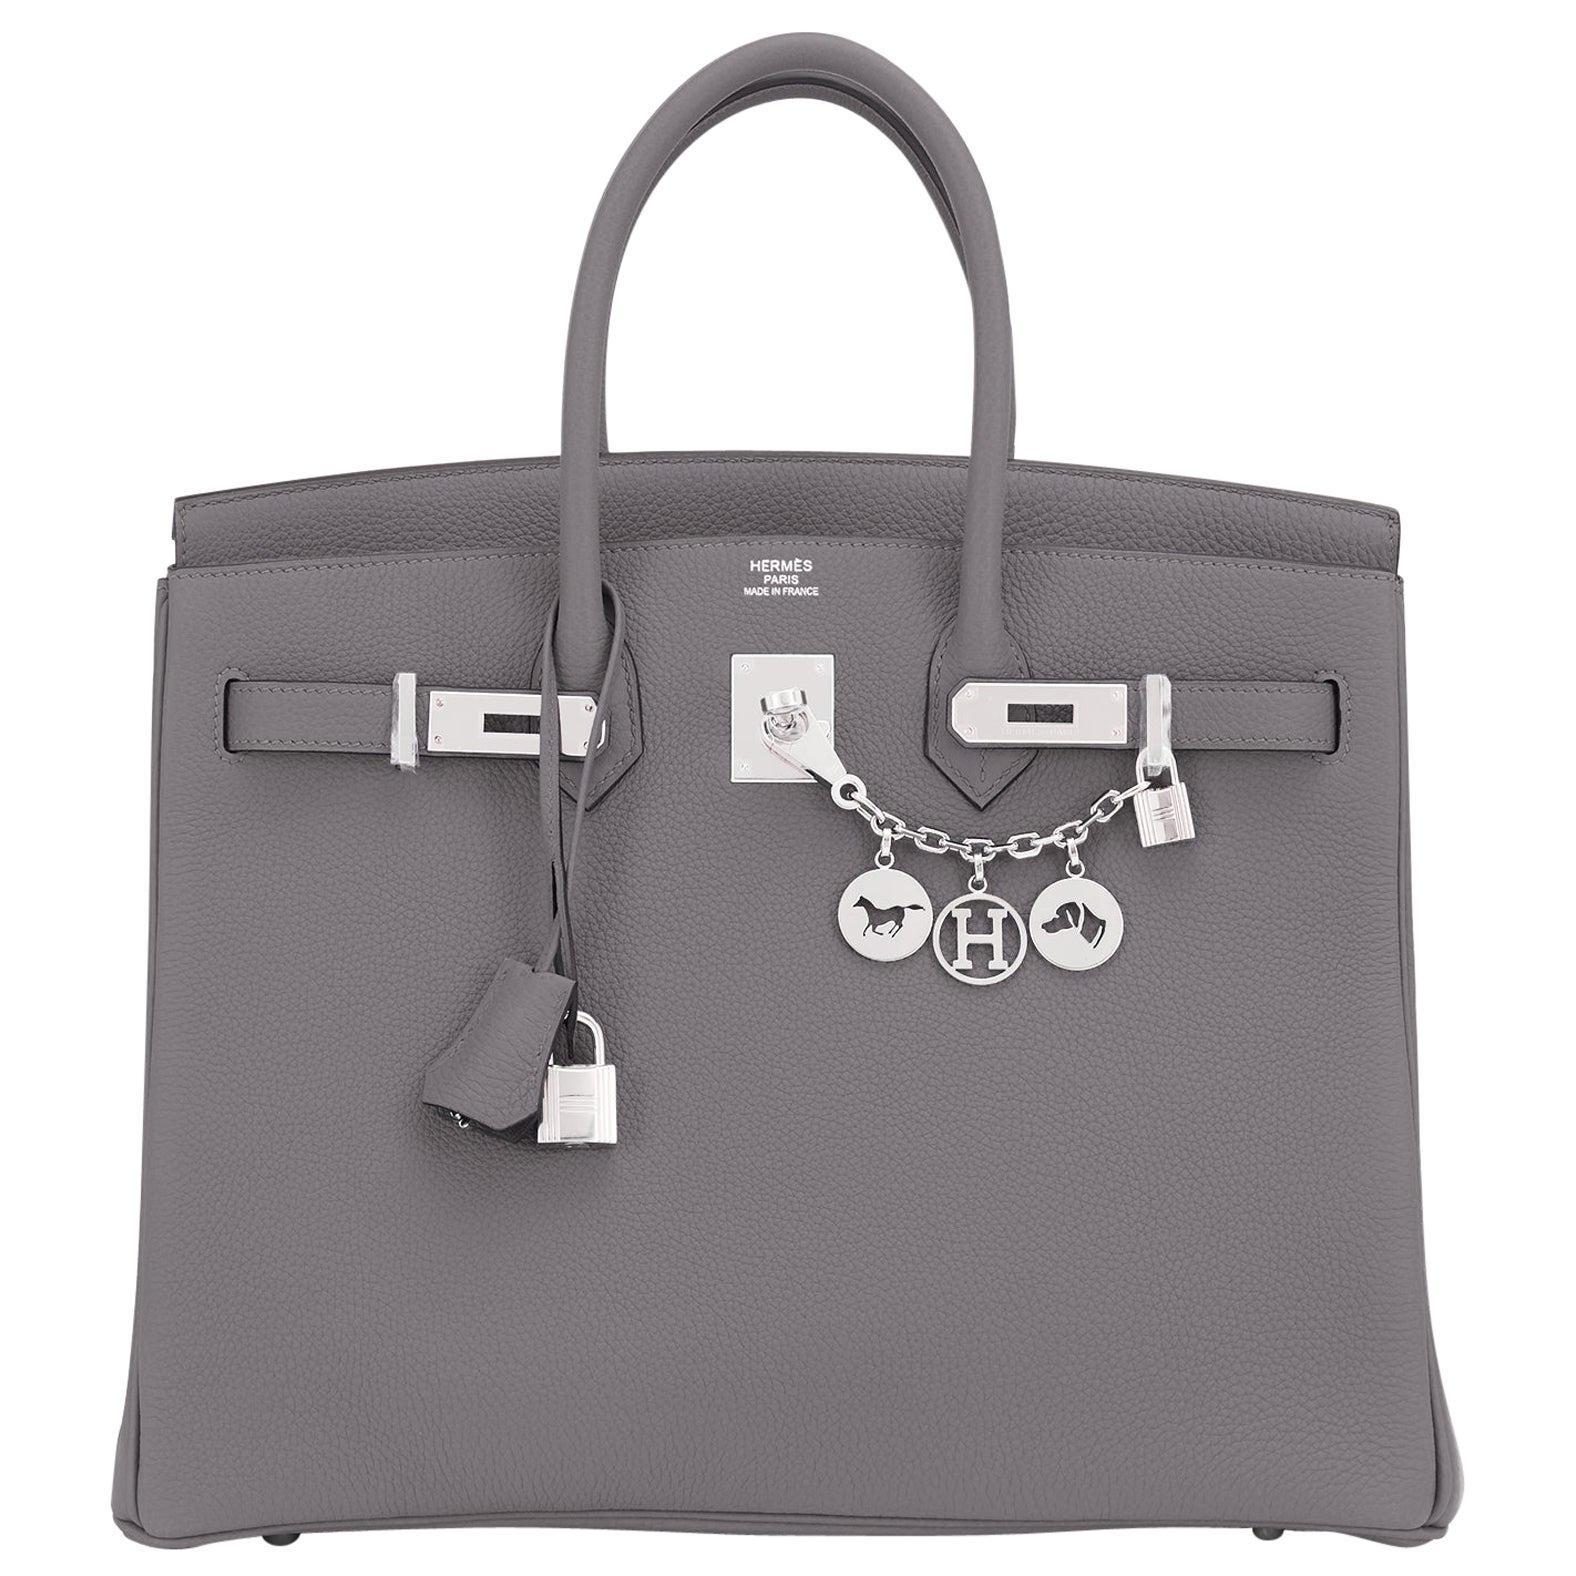 "Hermes Birkin 35cm Etain Togo ""Tin Grey"" Palladium Hardware Bag Z Stamp, 2021"